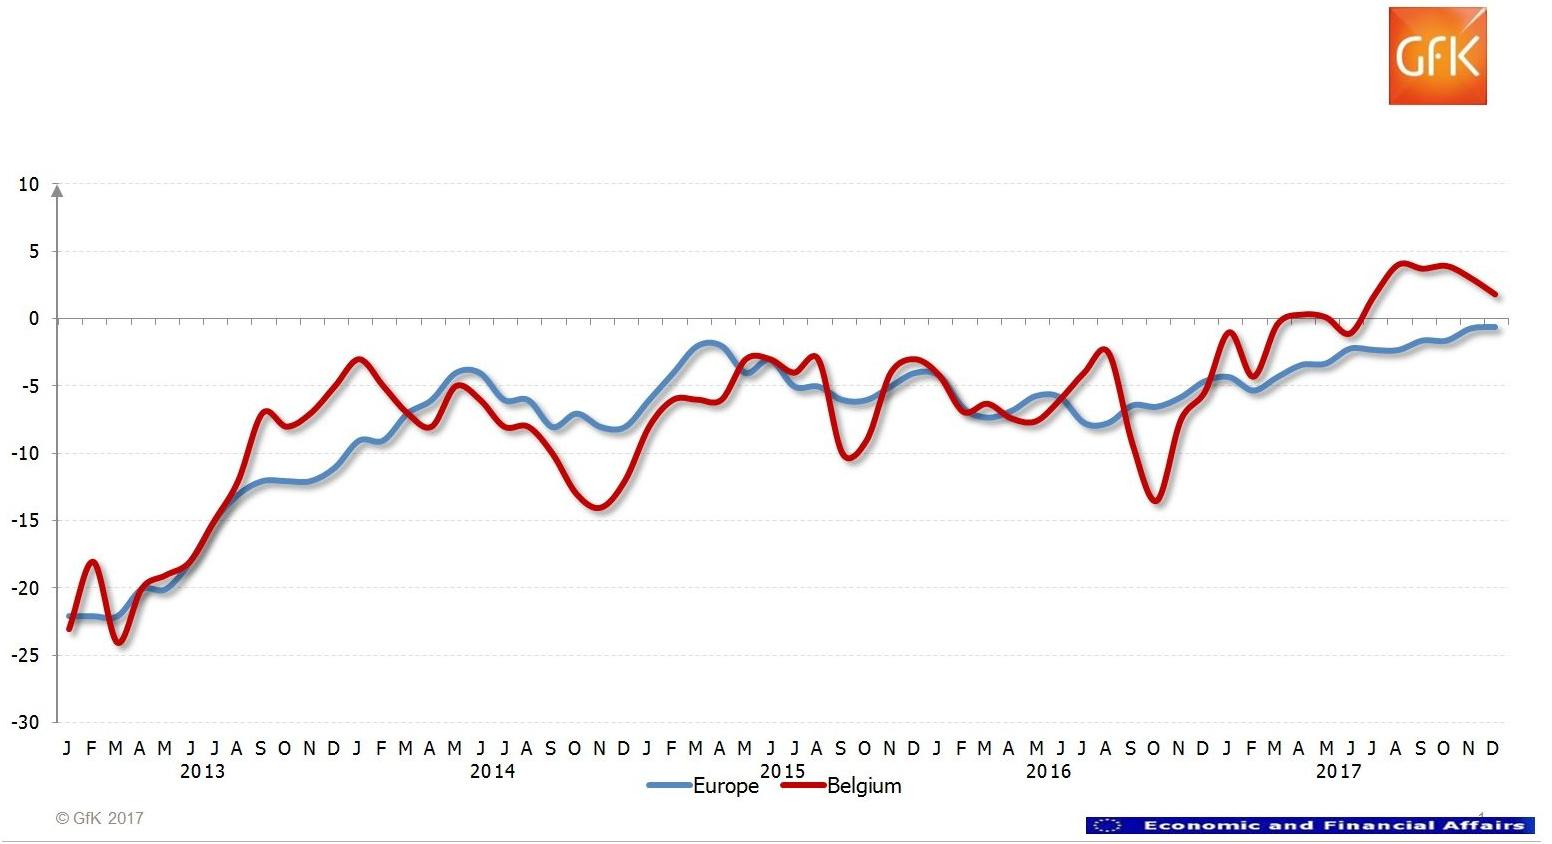 Indicator consumentenvertrouwen 2013-2017 België vs. Europa